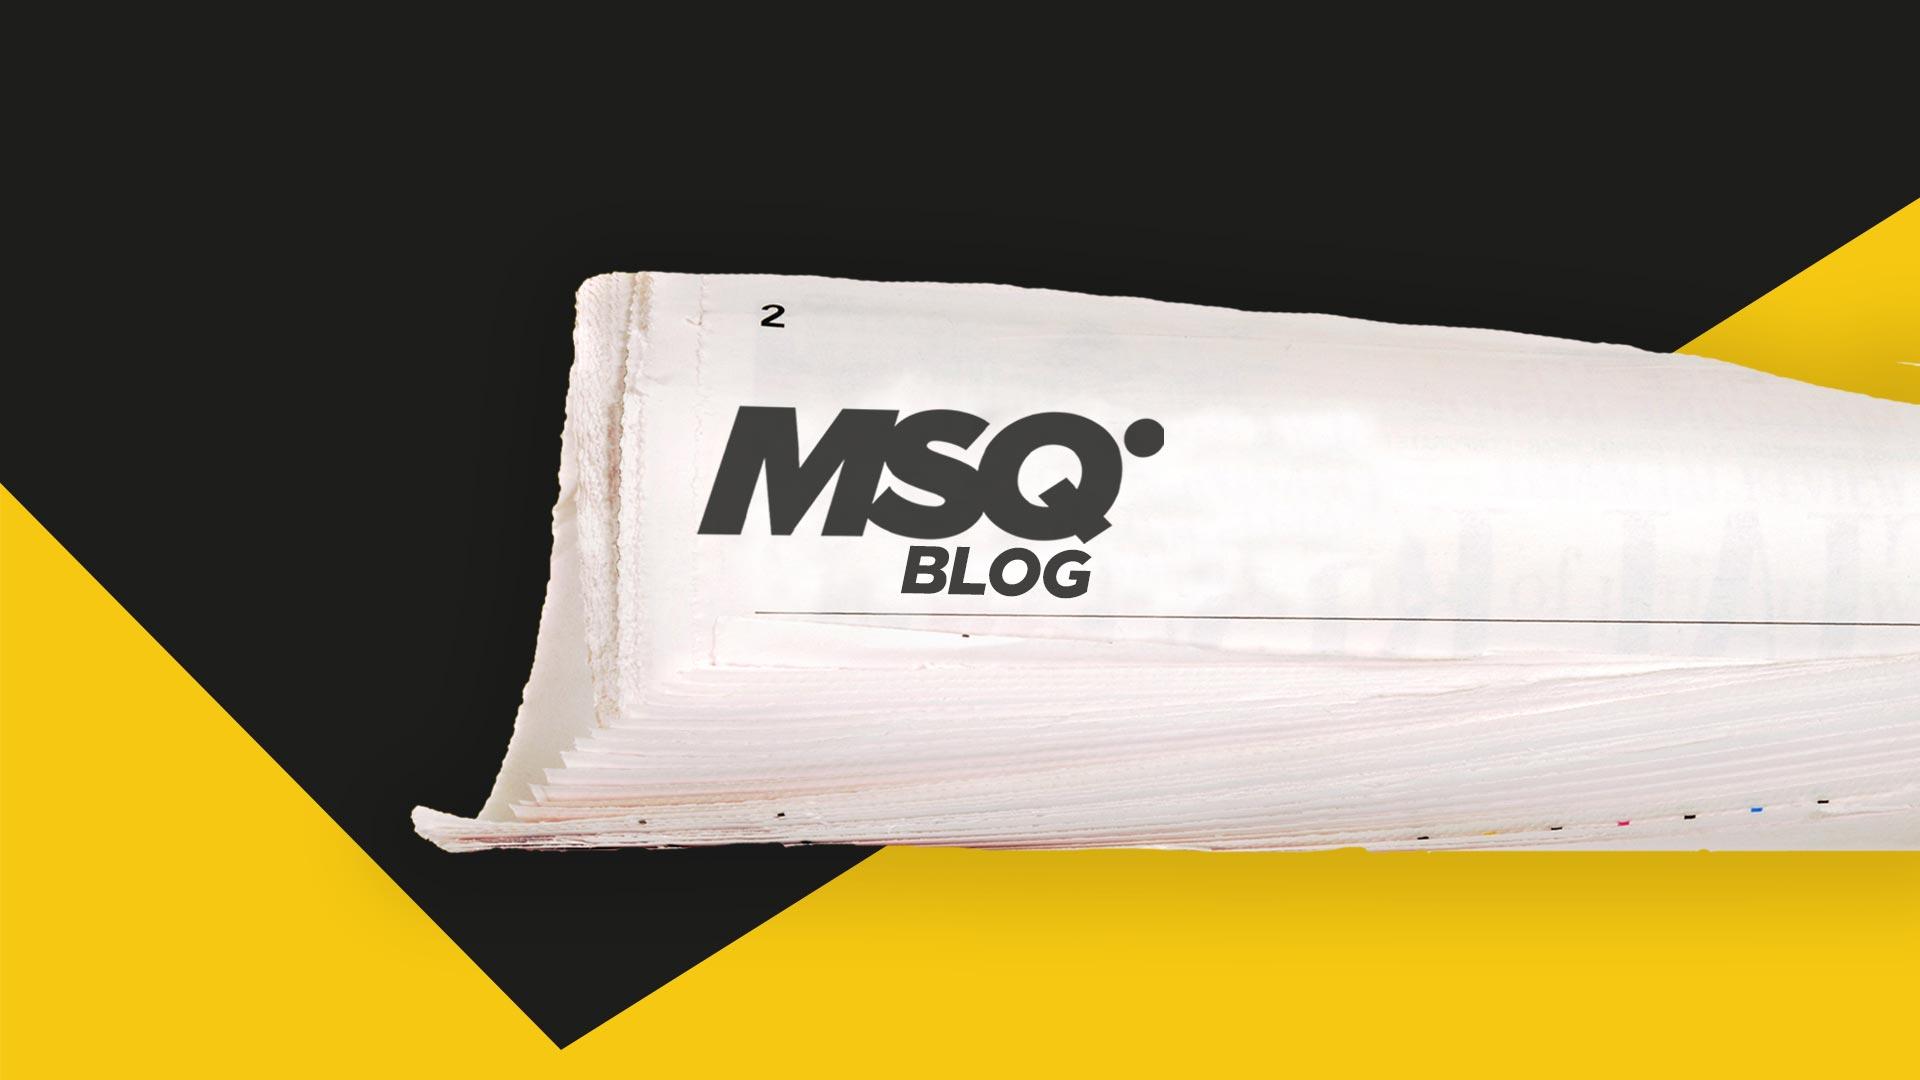 Blog MSQ